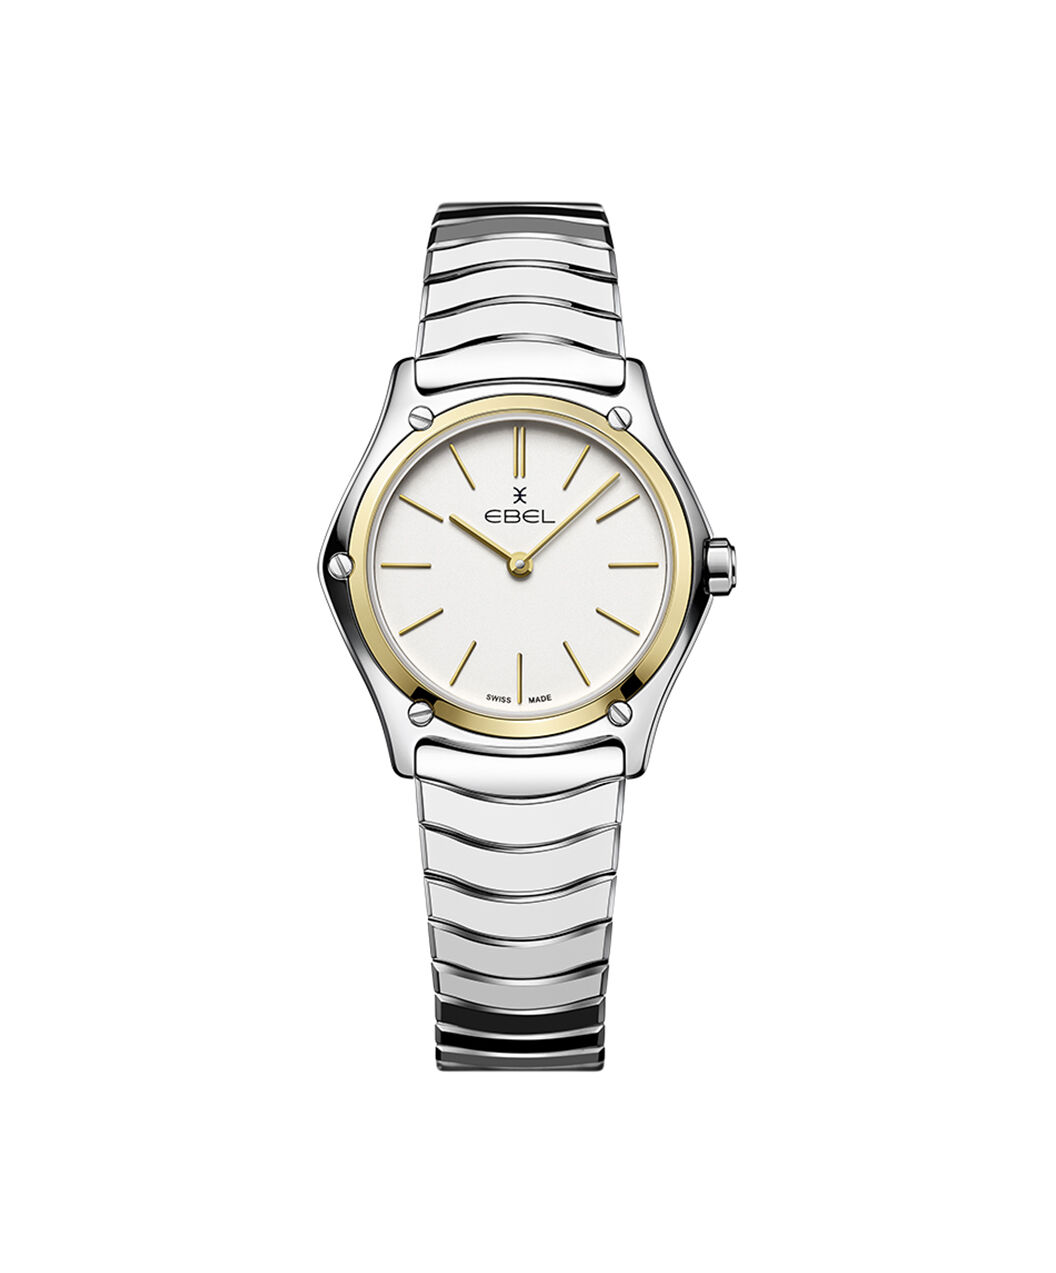 Chopard Watches Replicas